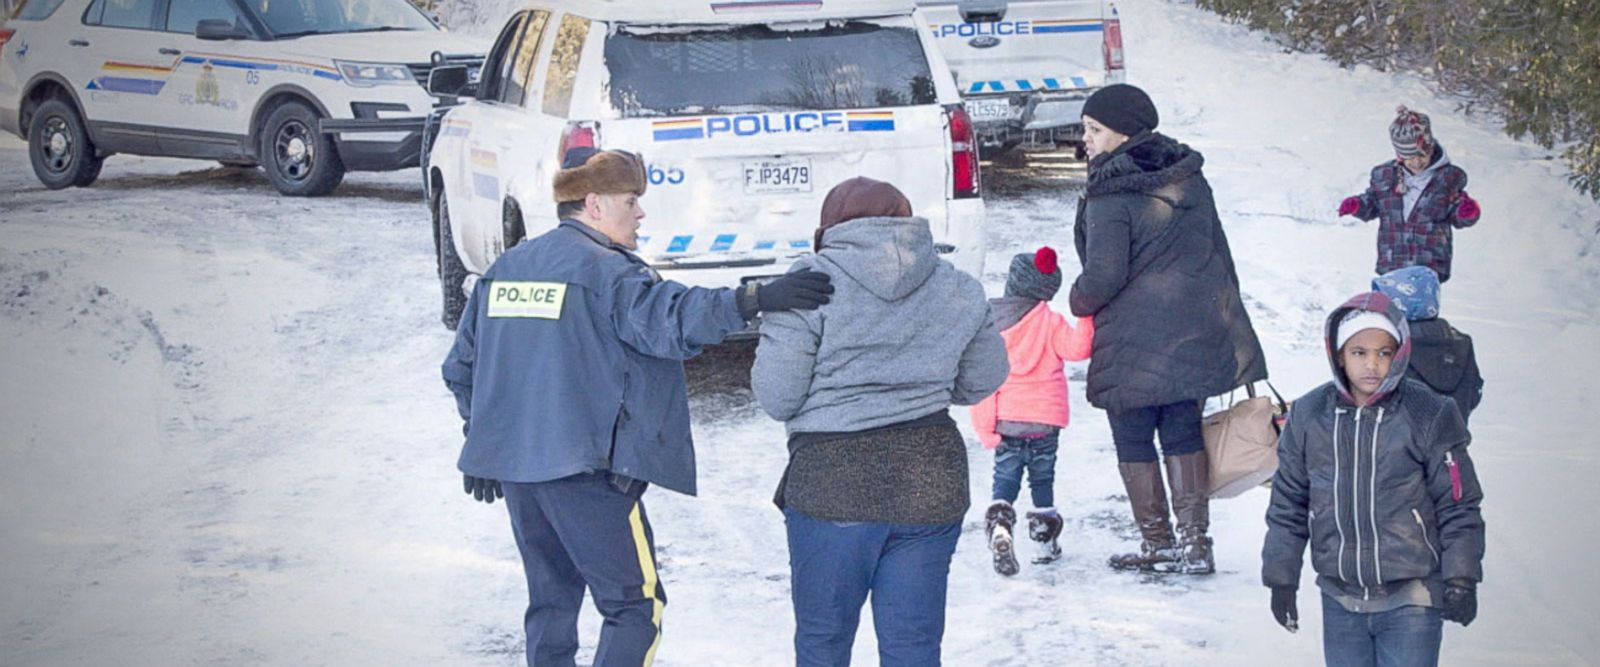 VIDEO: Canadian border has immigrants heading its way